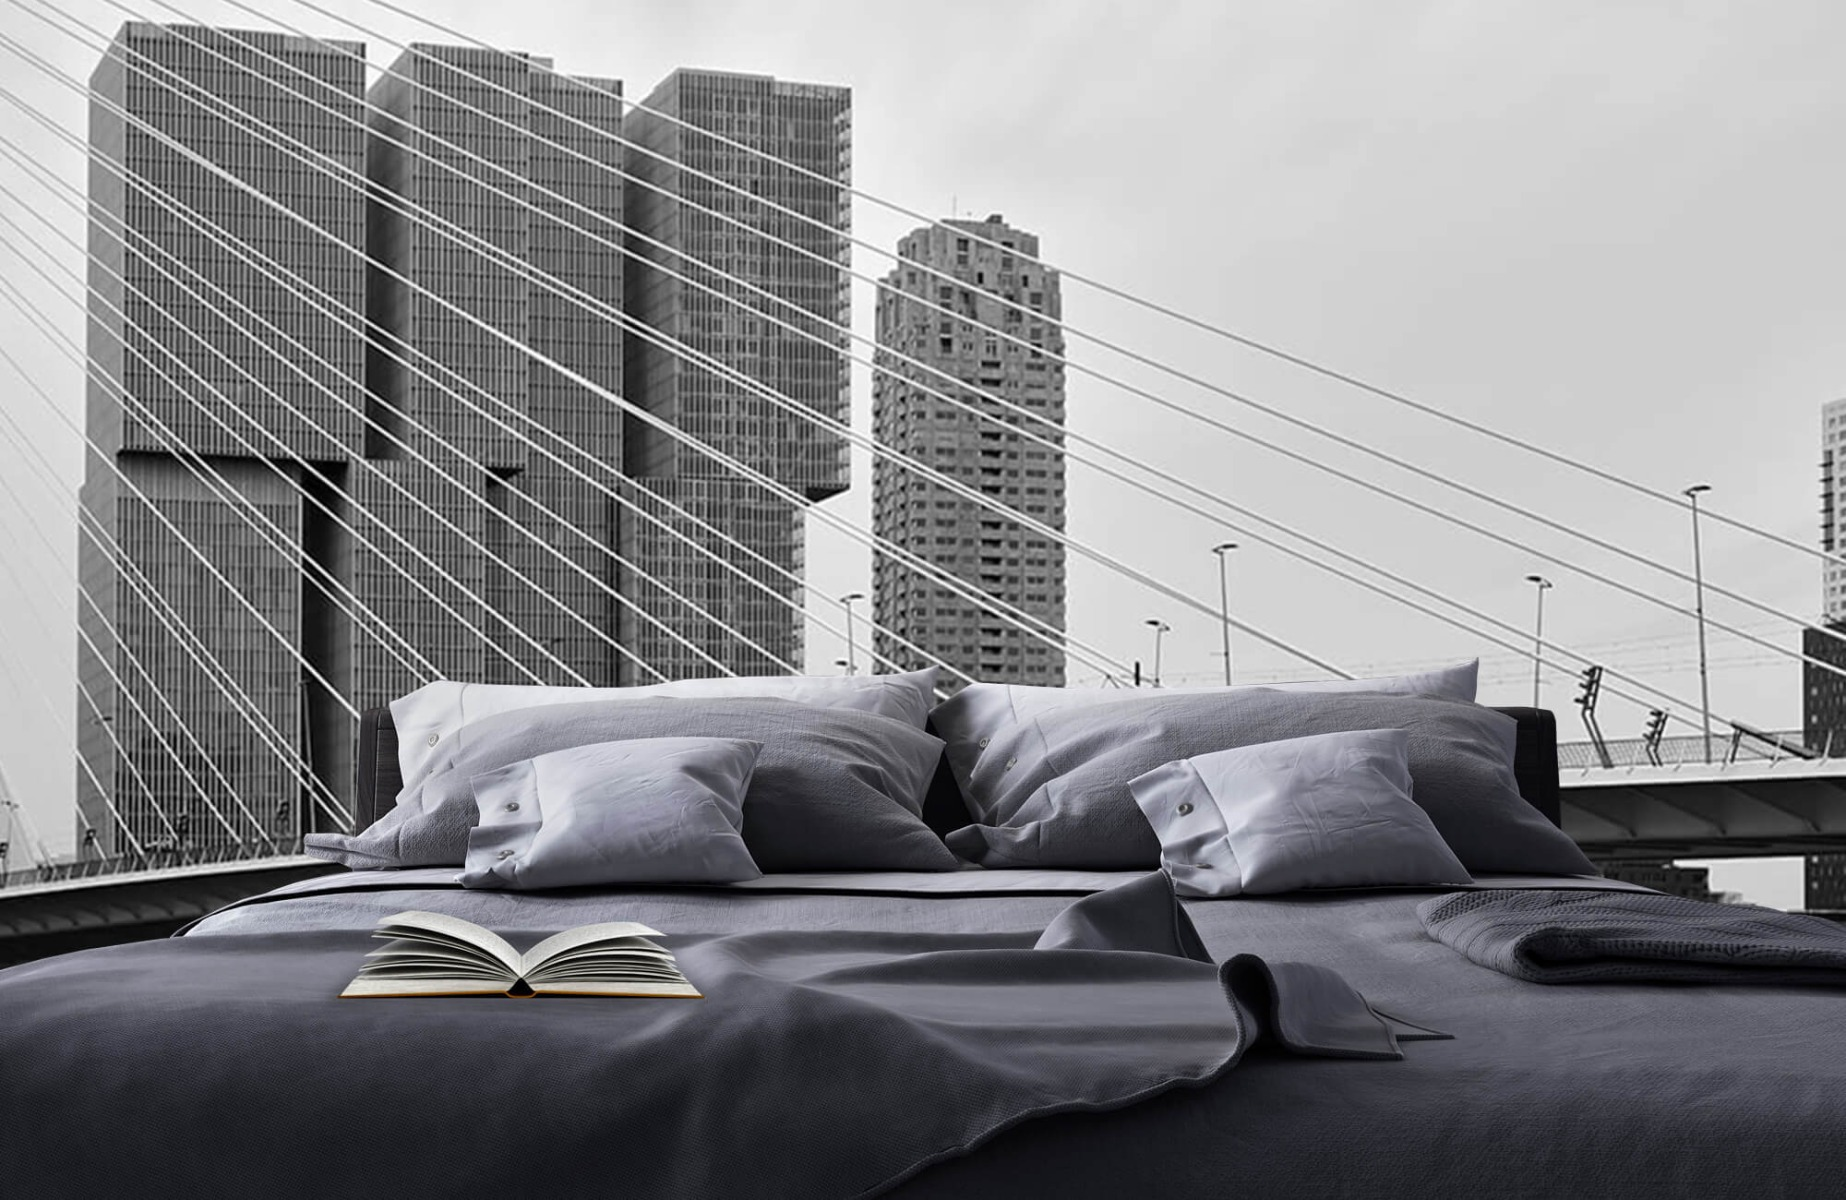 Steden behang - Erasmusbrug zwart wit - Wallexclusive - Slaapkamer 17